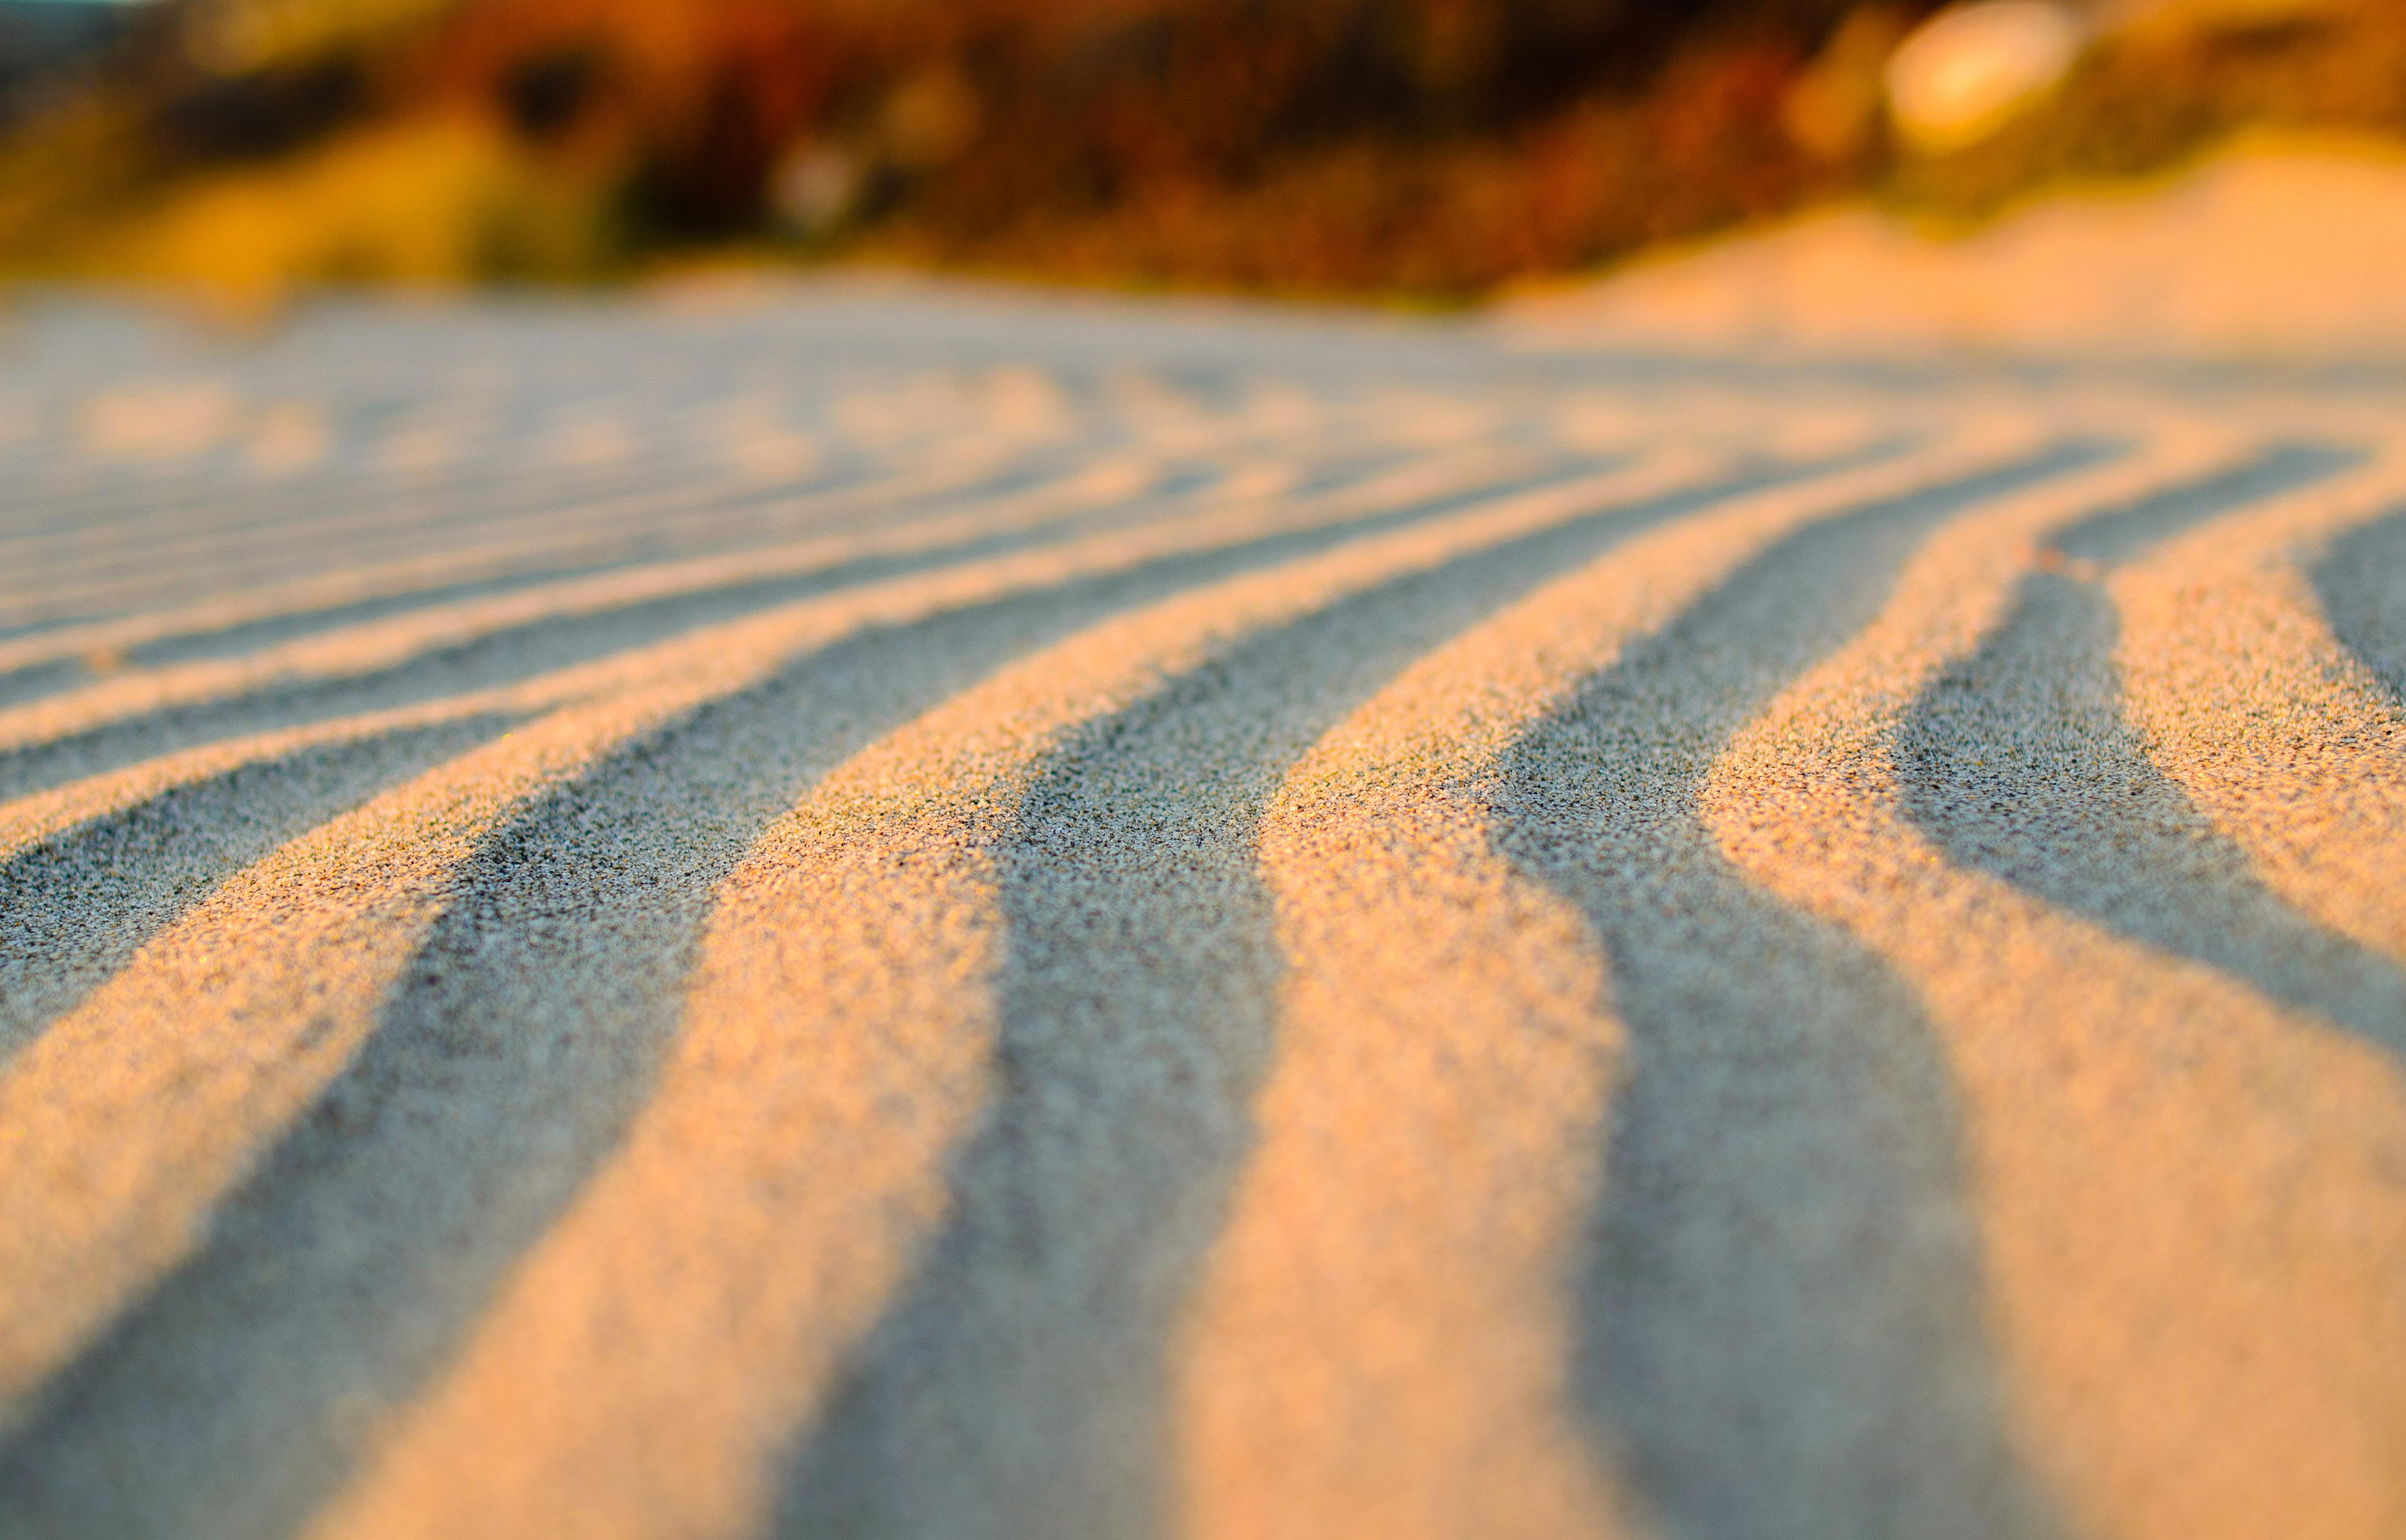 neilson bay area travel landscape photography pajaro dunes sand grooves